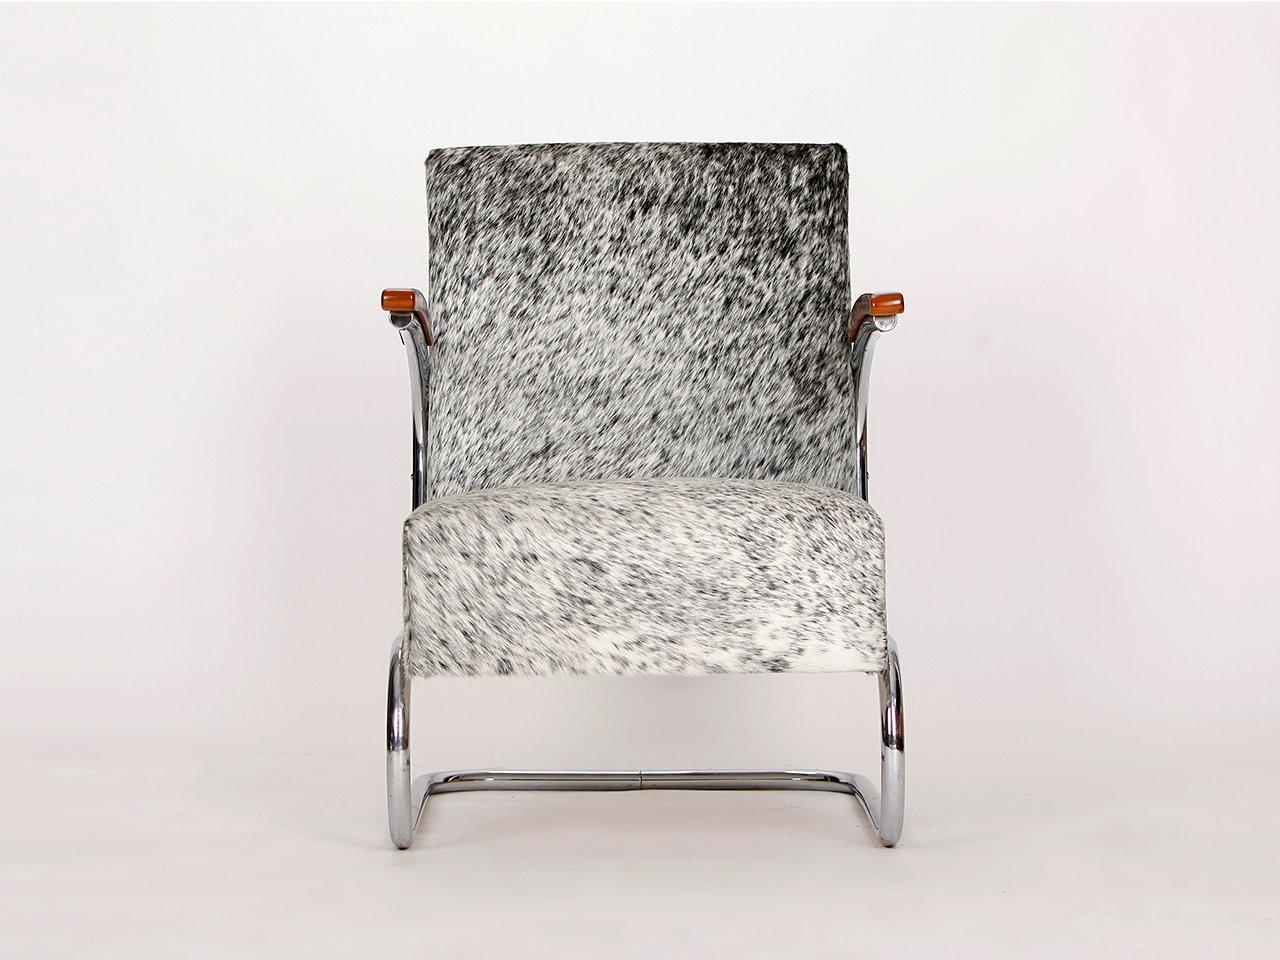 Stahlrohr Sessel stahlrohr sessel 1930er bei pamono kaufen